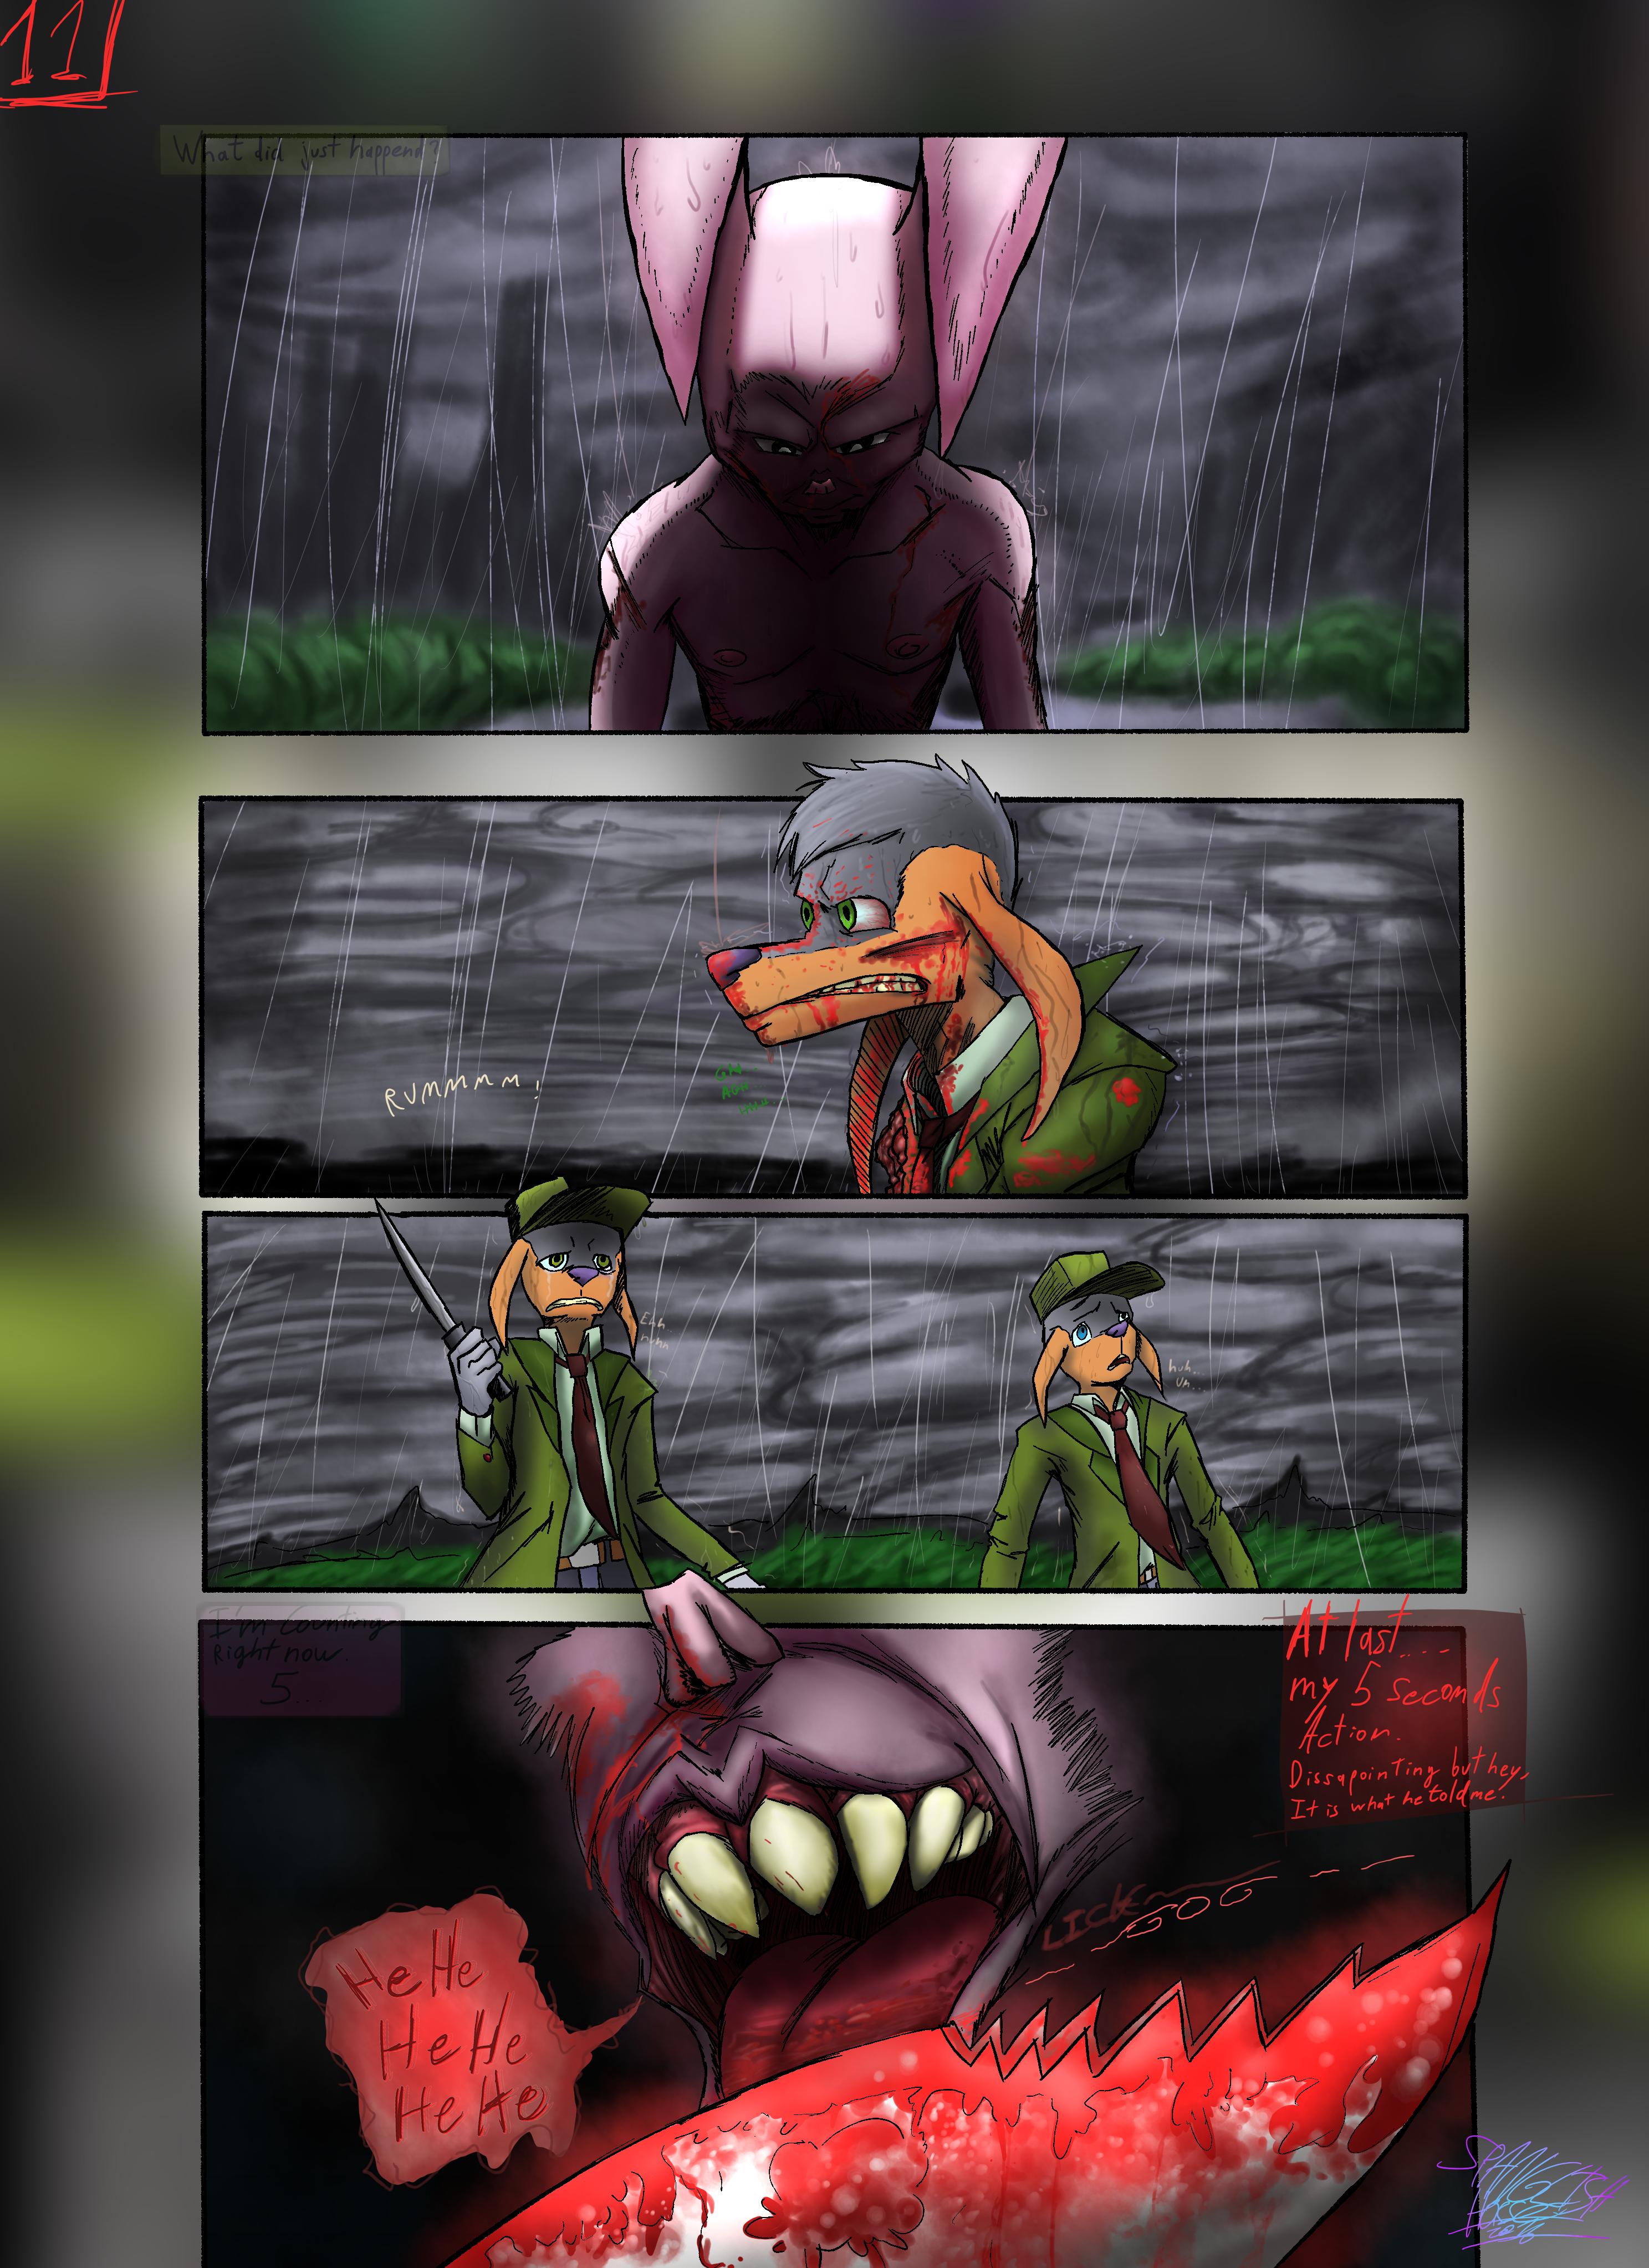 Bob the Psycho Rabbit Vs Alfred Alfer Page 11 (comic) (11/39)